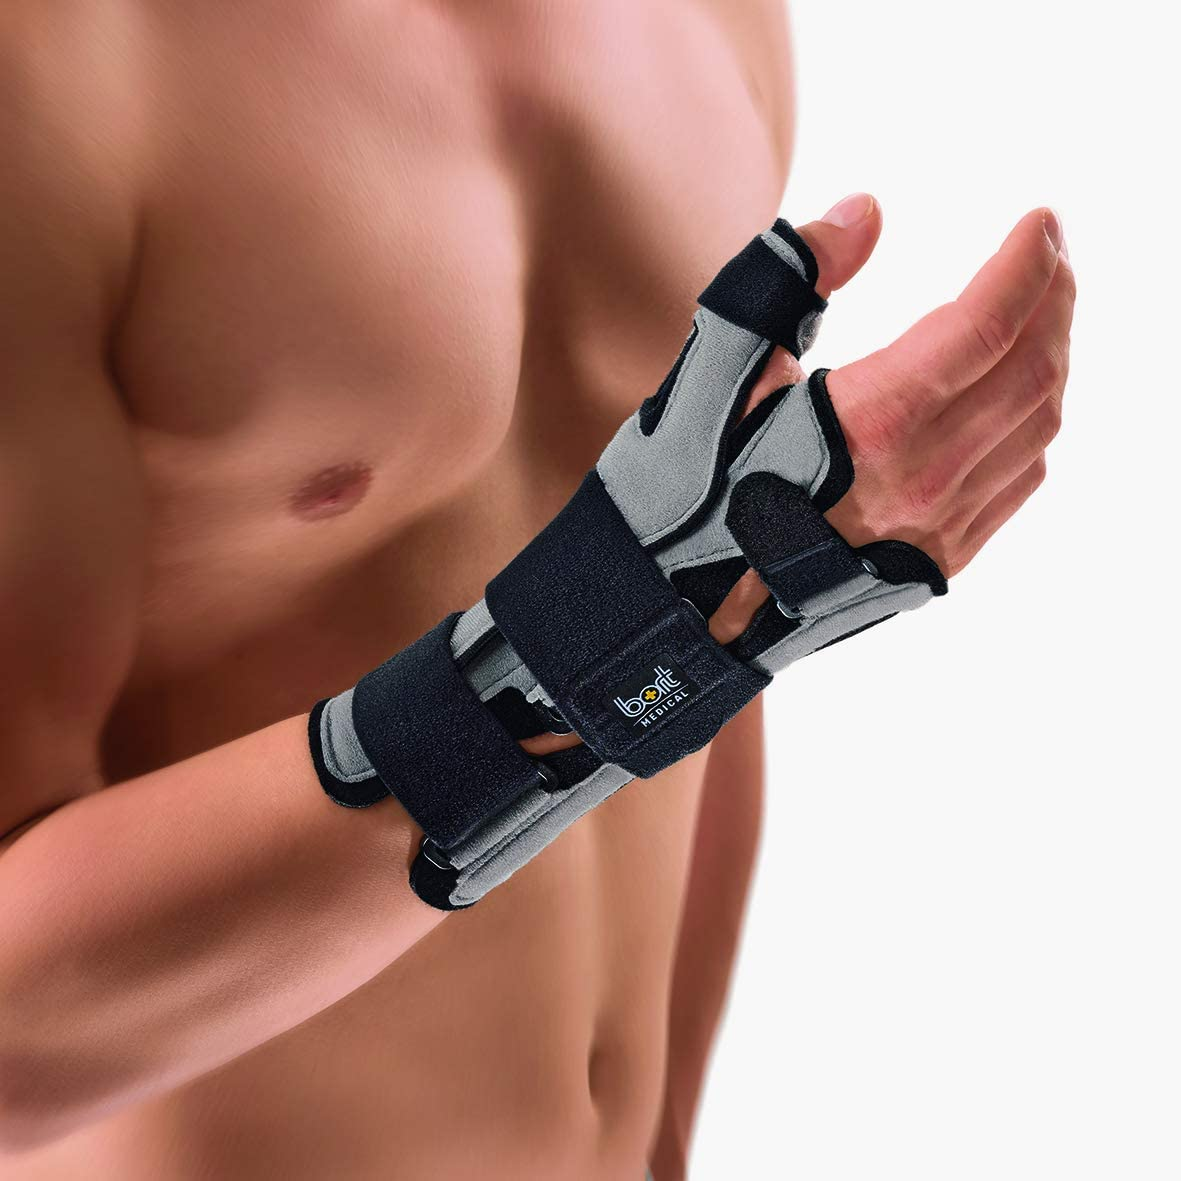 Bort 112050 SellaTex® Wrist Spica and Thumb Fracture Splint Removable Thumb Carpal Tunnel, Wrist Fracture, Thumb Fracture, Wrist Thumb Pain, Day Night Splint Splint, Immobilzer (Grey, XLarge, Left)